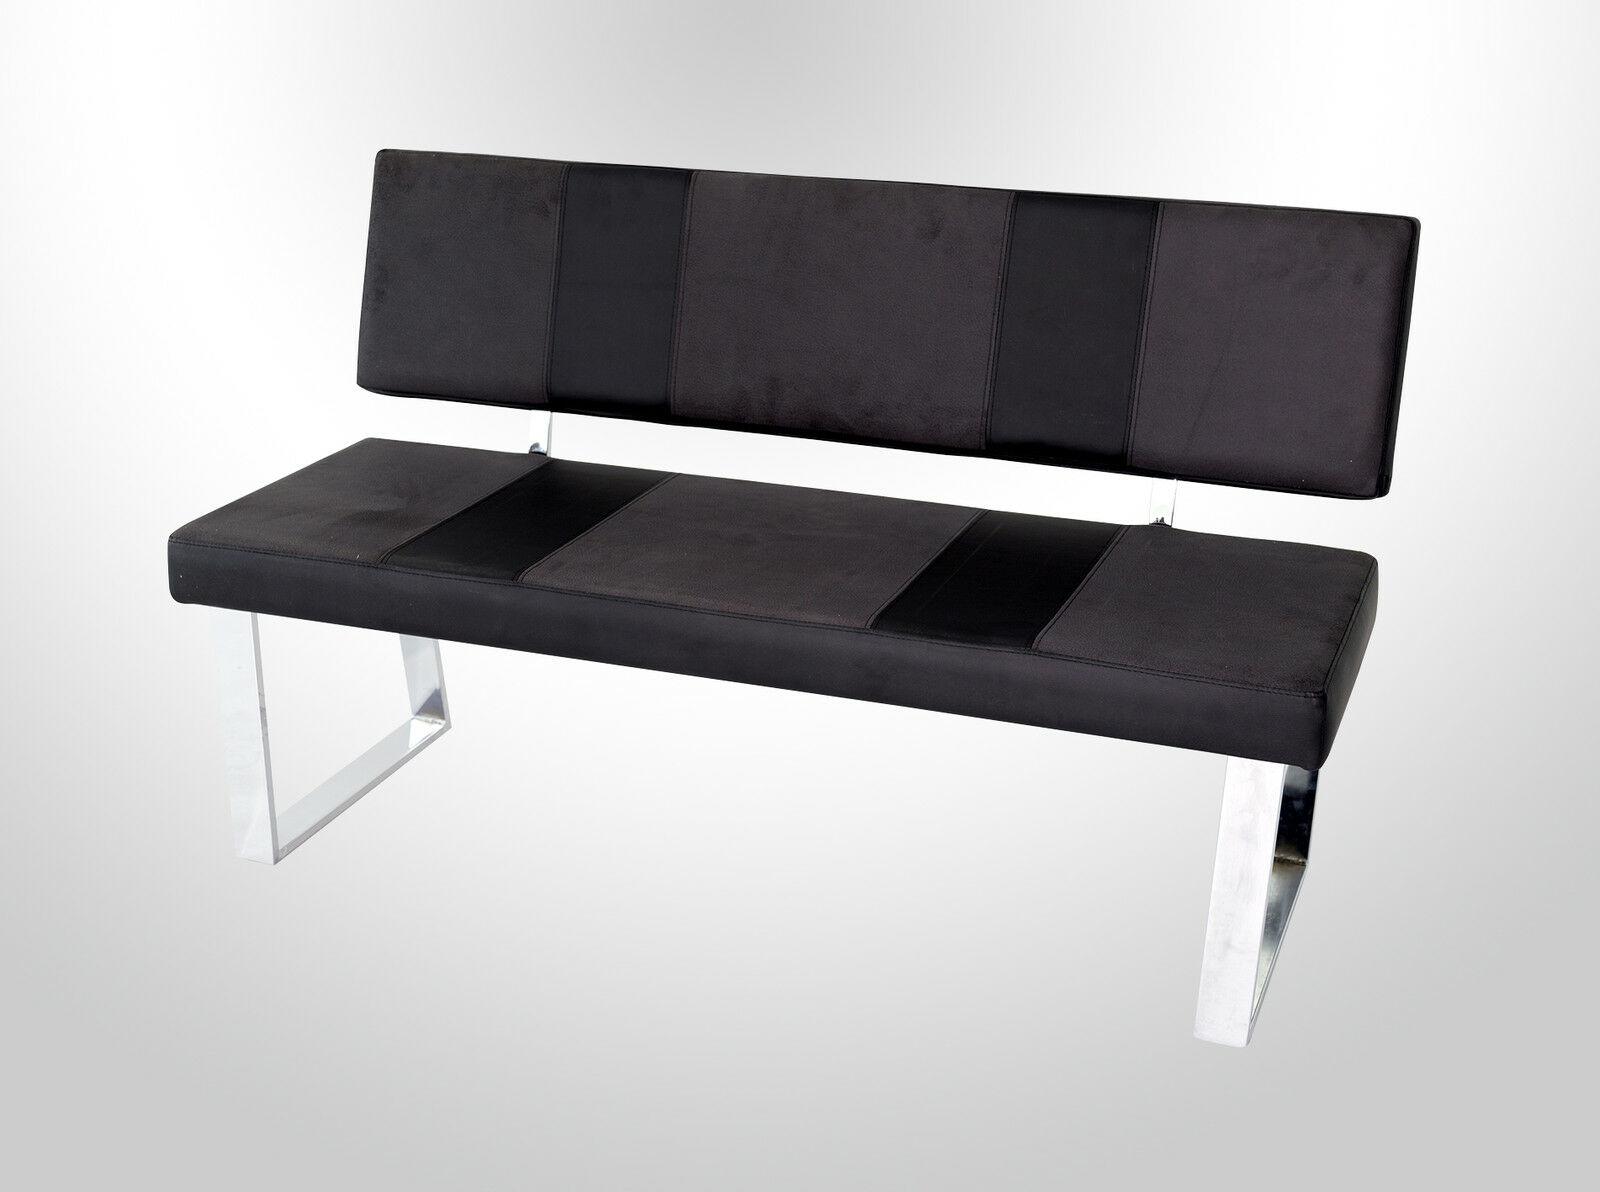 Moderne Sitzbank Grau Schwarz Hockerbank Design Leder Look Gunstig